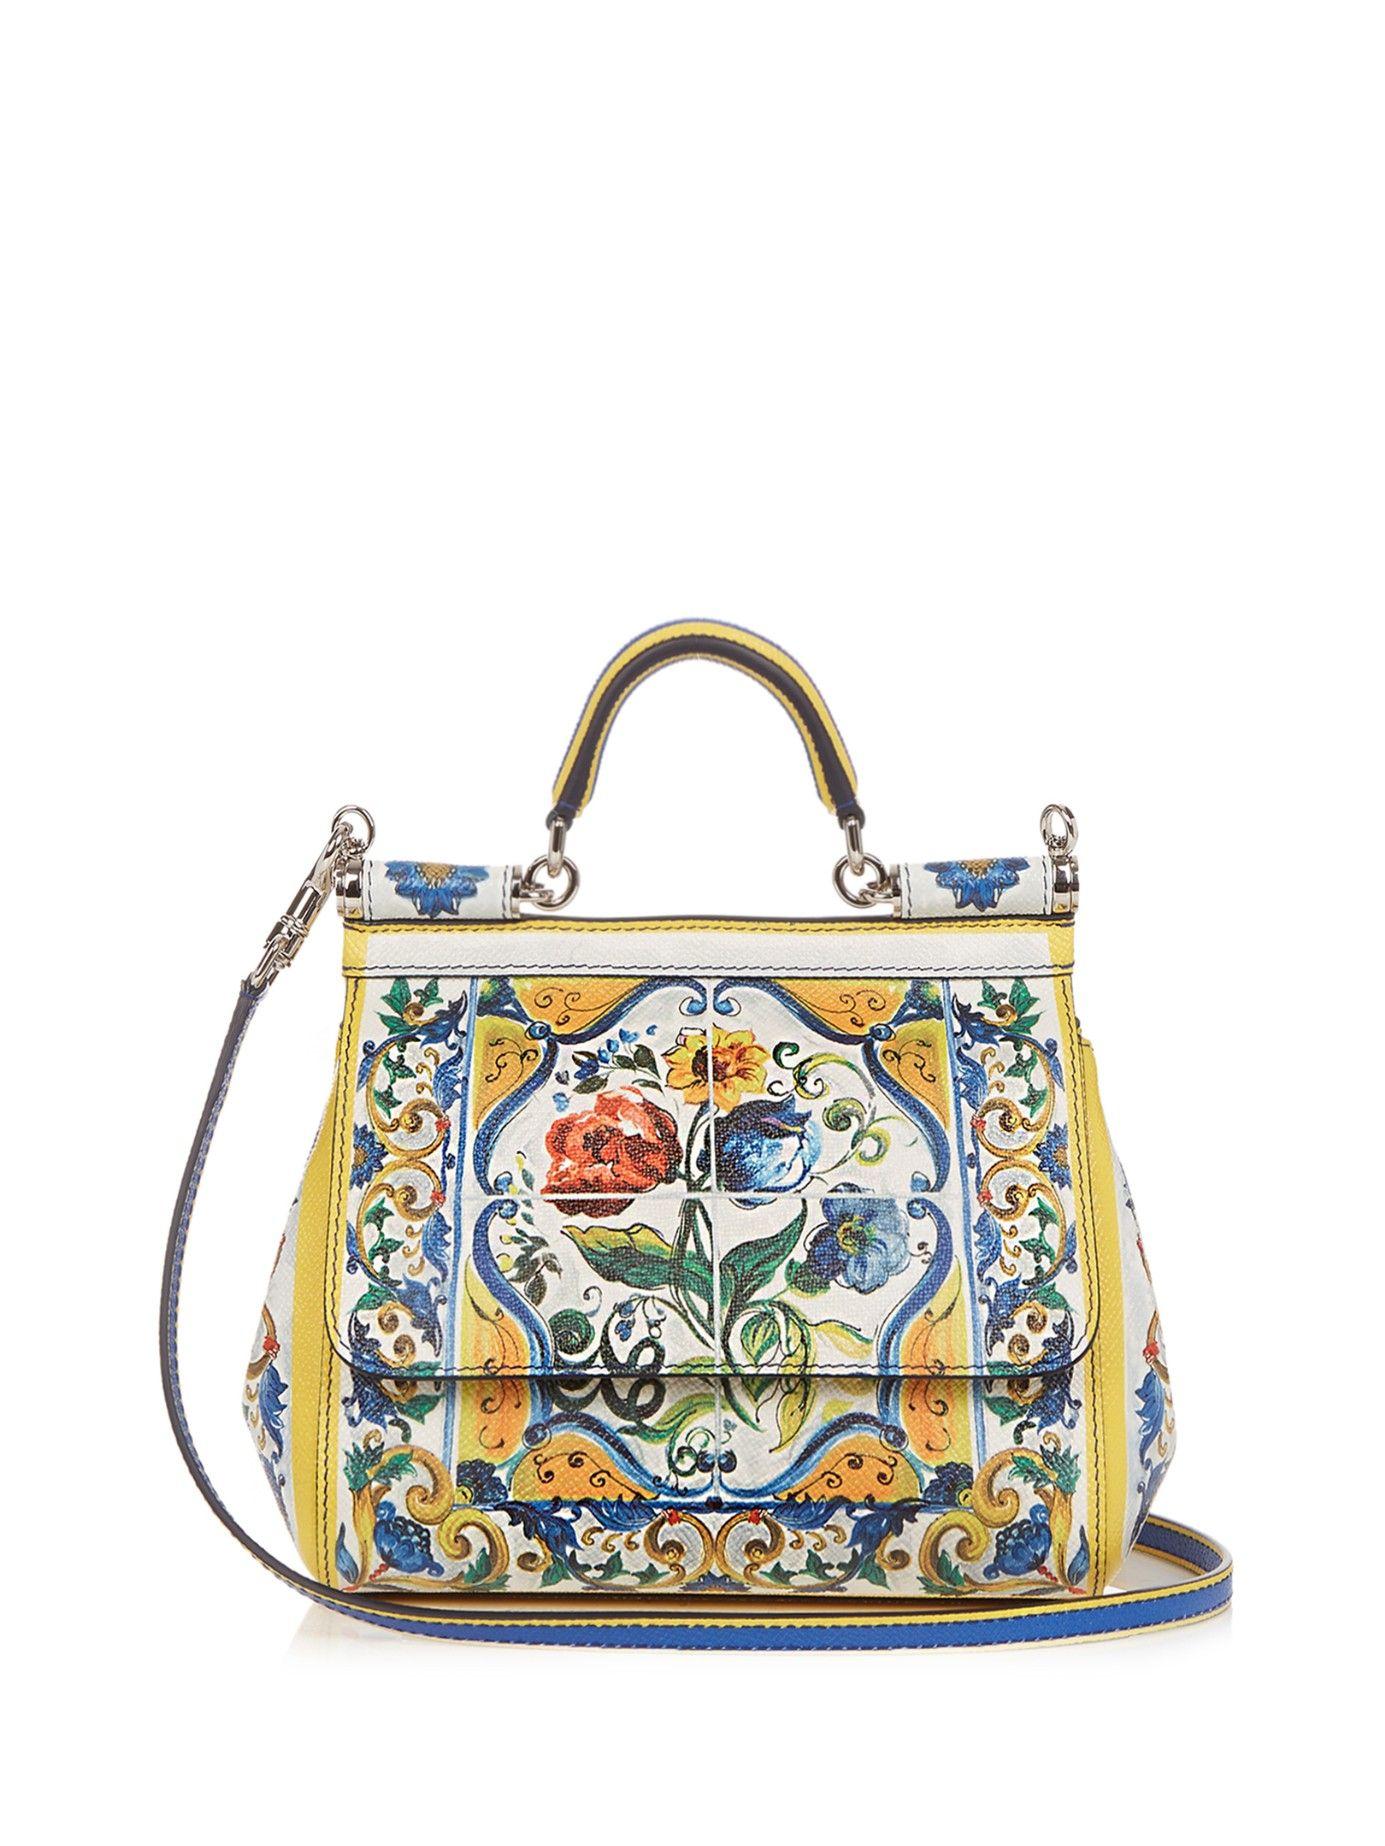 6ef1349483 Lyst - Dolce & Gabbana Sicily Small Majolica-print Leather Cross-body Bag